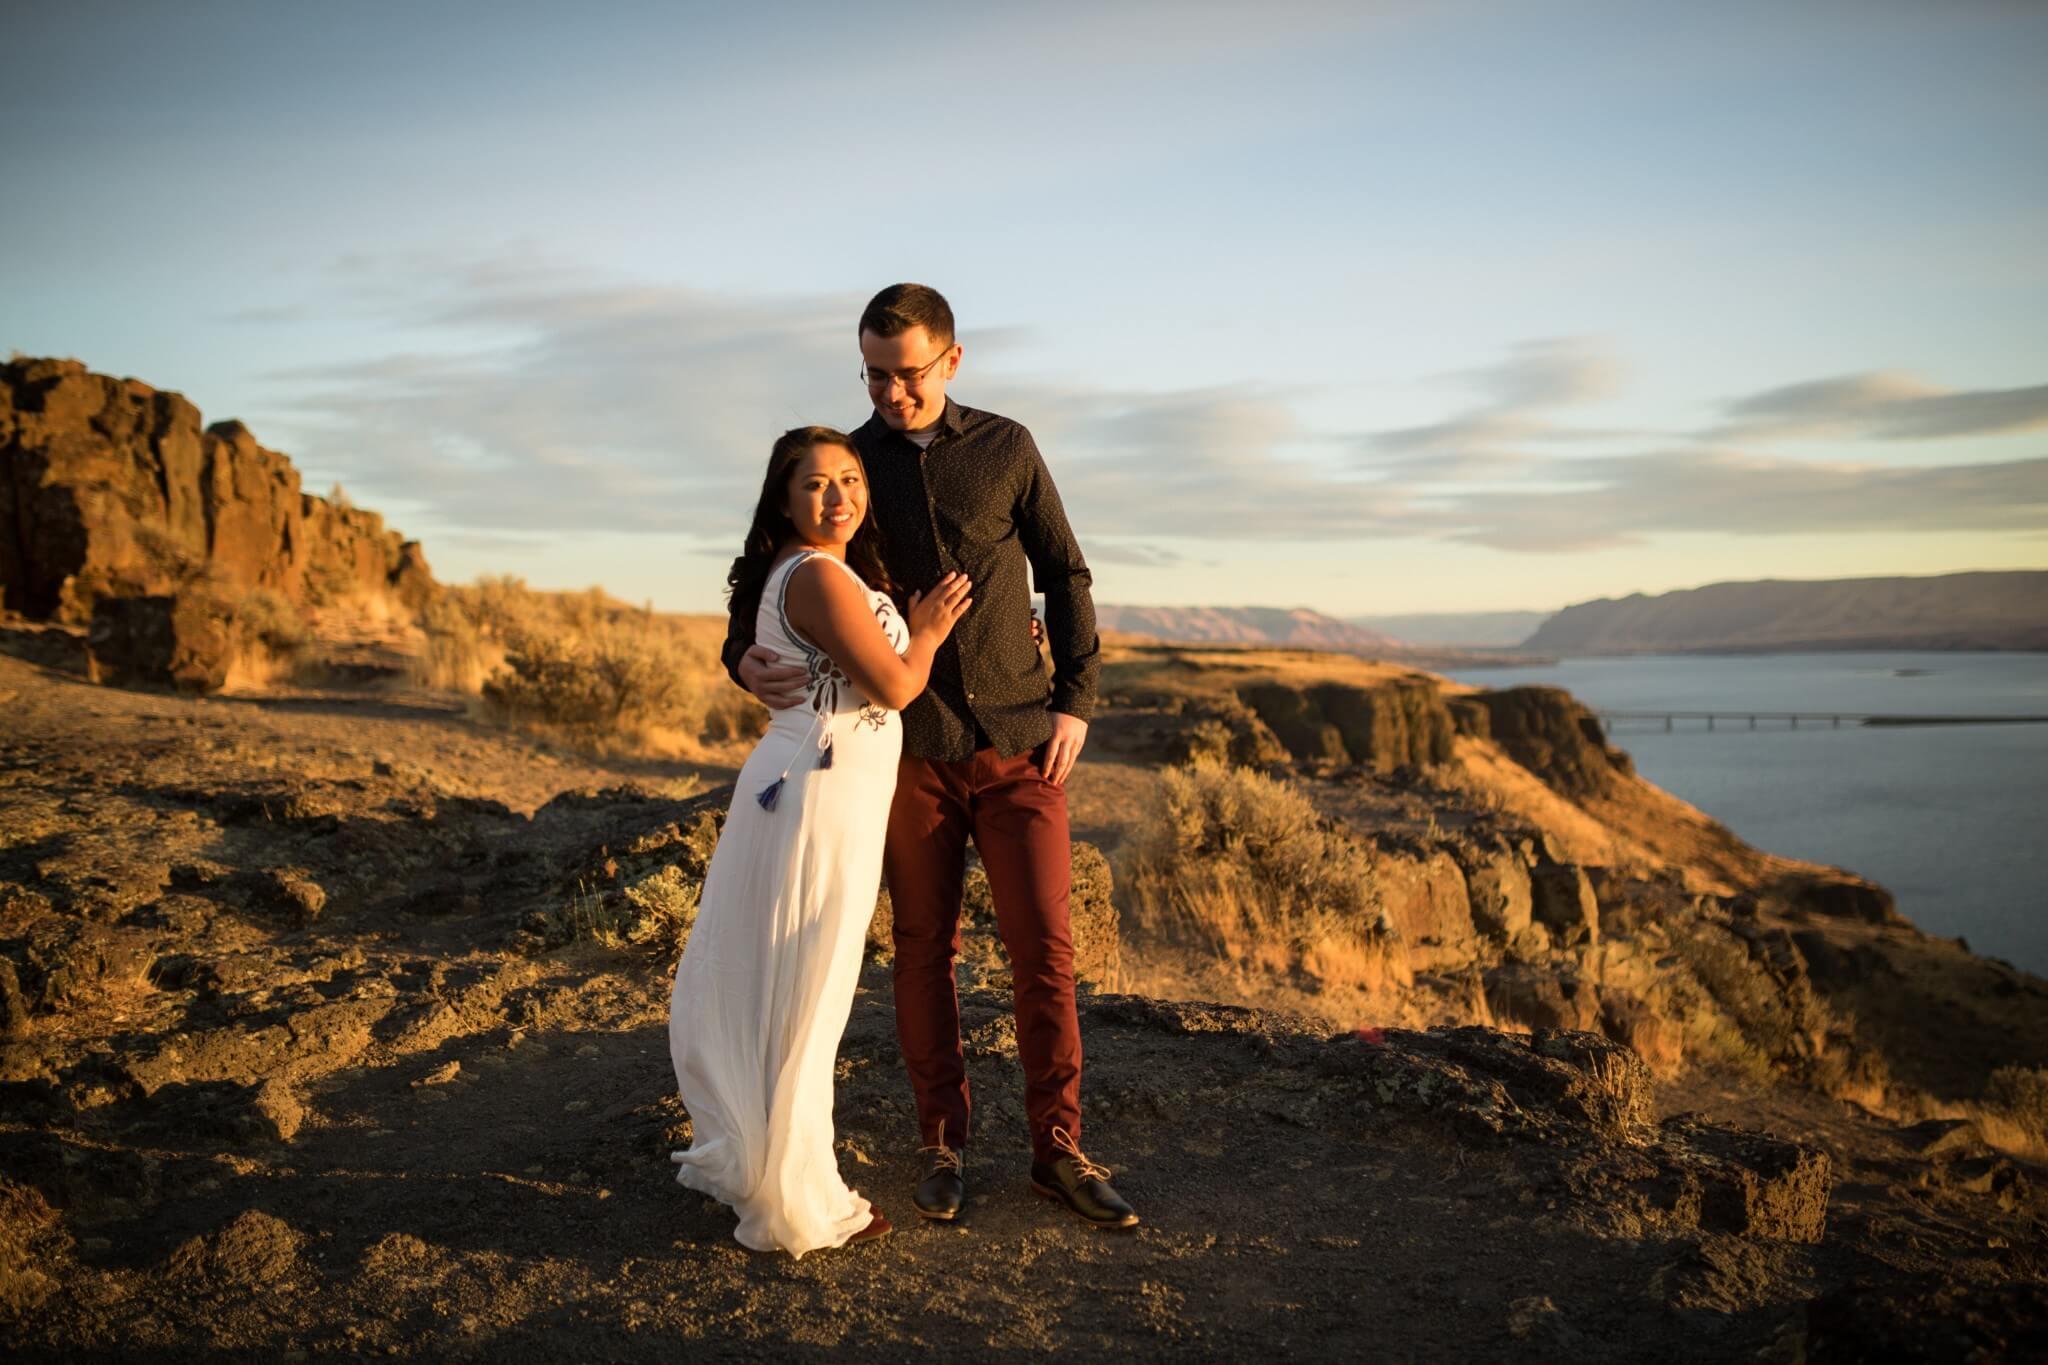 Lesly & Michael Vantage Engagement by Bill Weisgerber Spokane Photographer (51 of 71).jpg